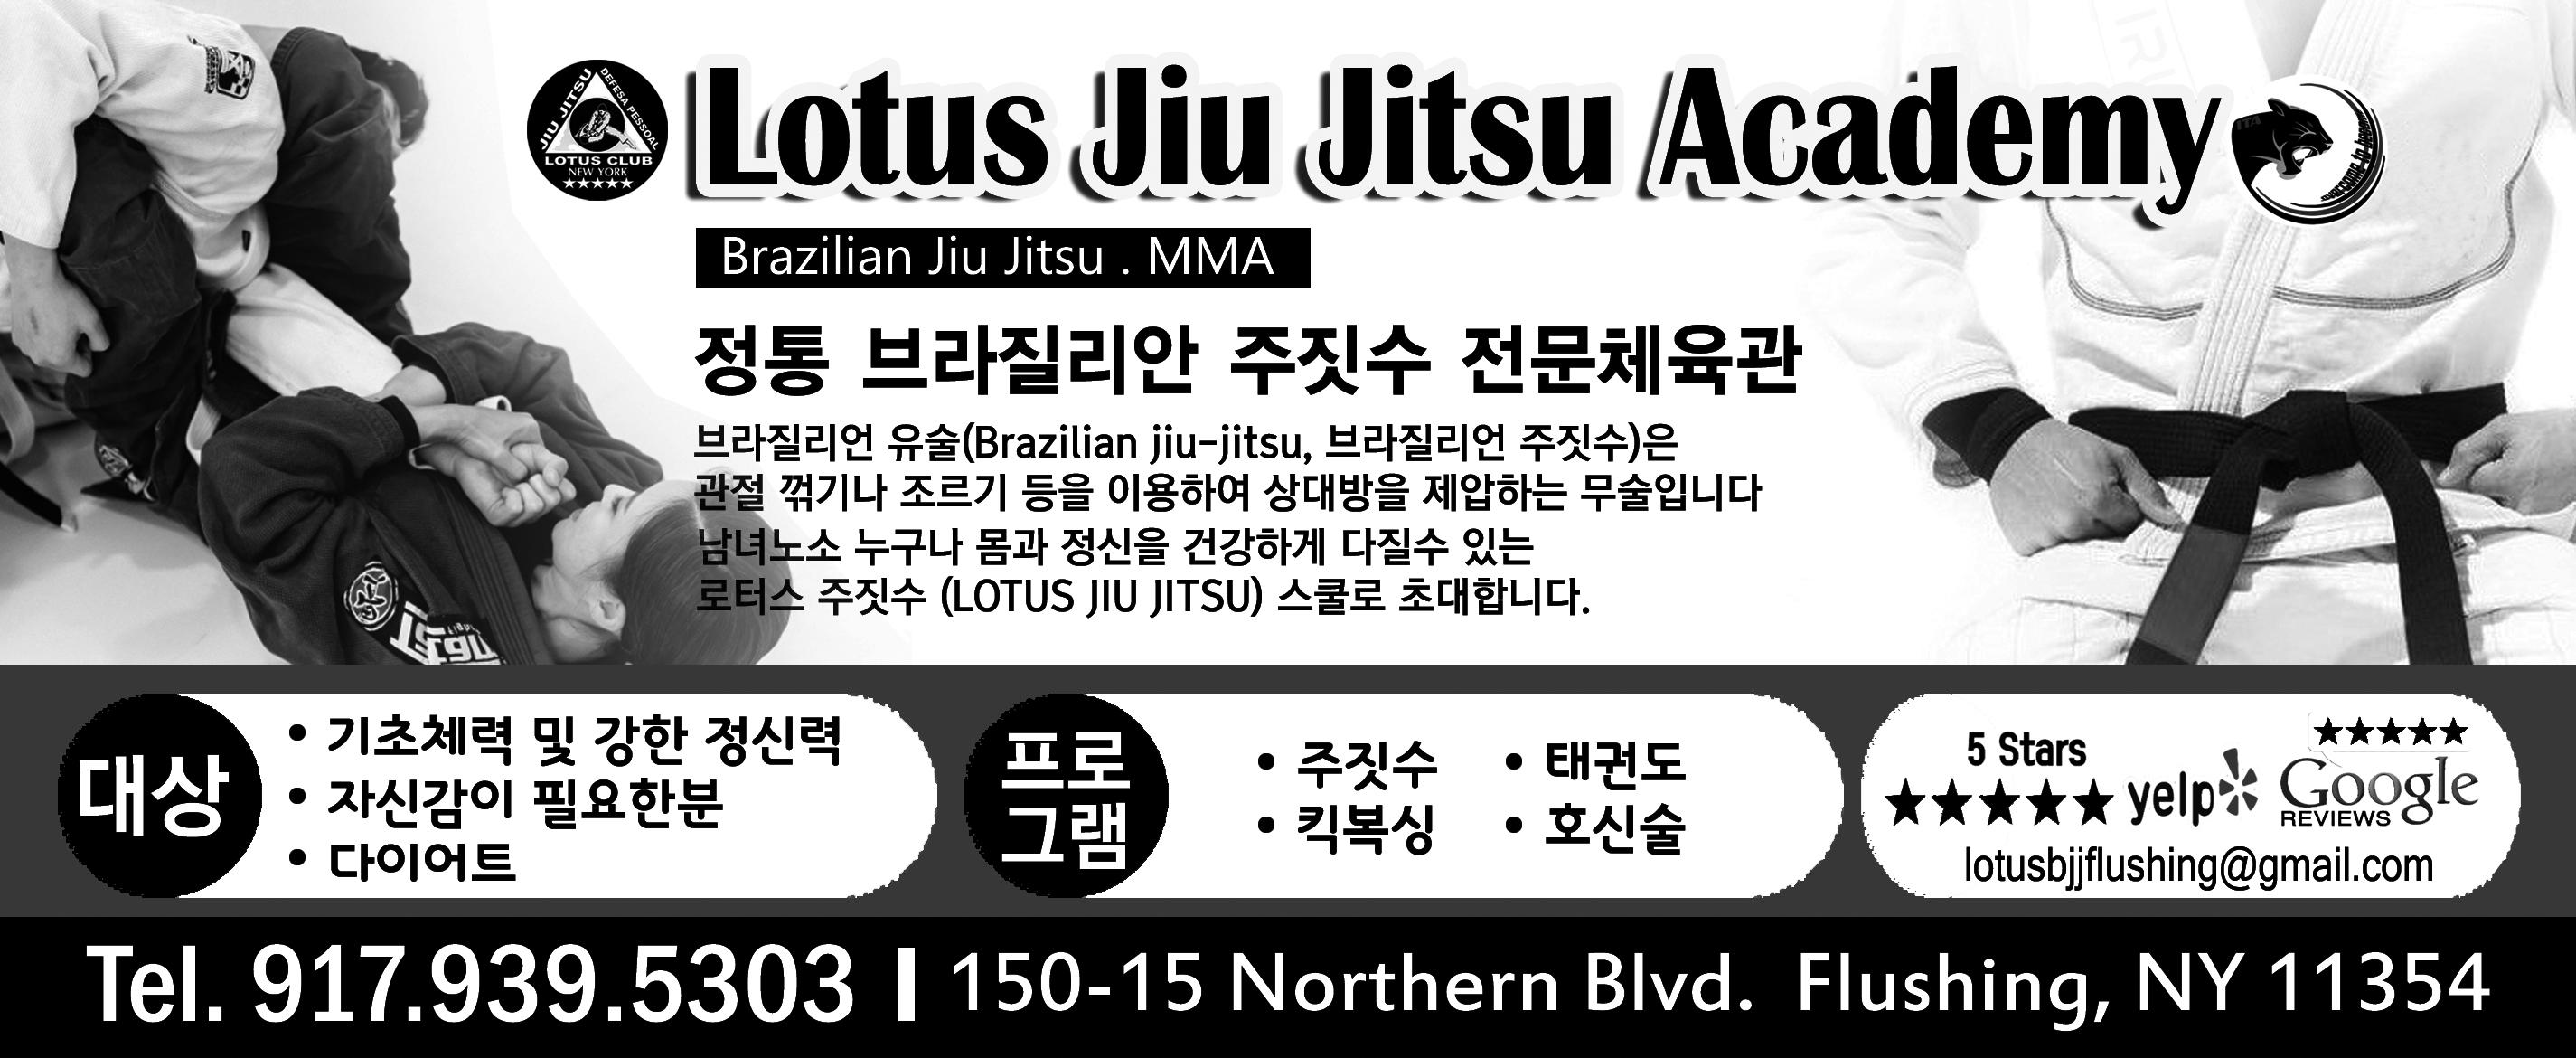 3B_Lotus Jin Jitsu Academy_092019.jpg